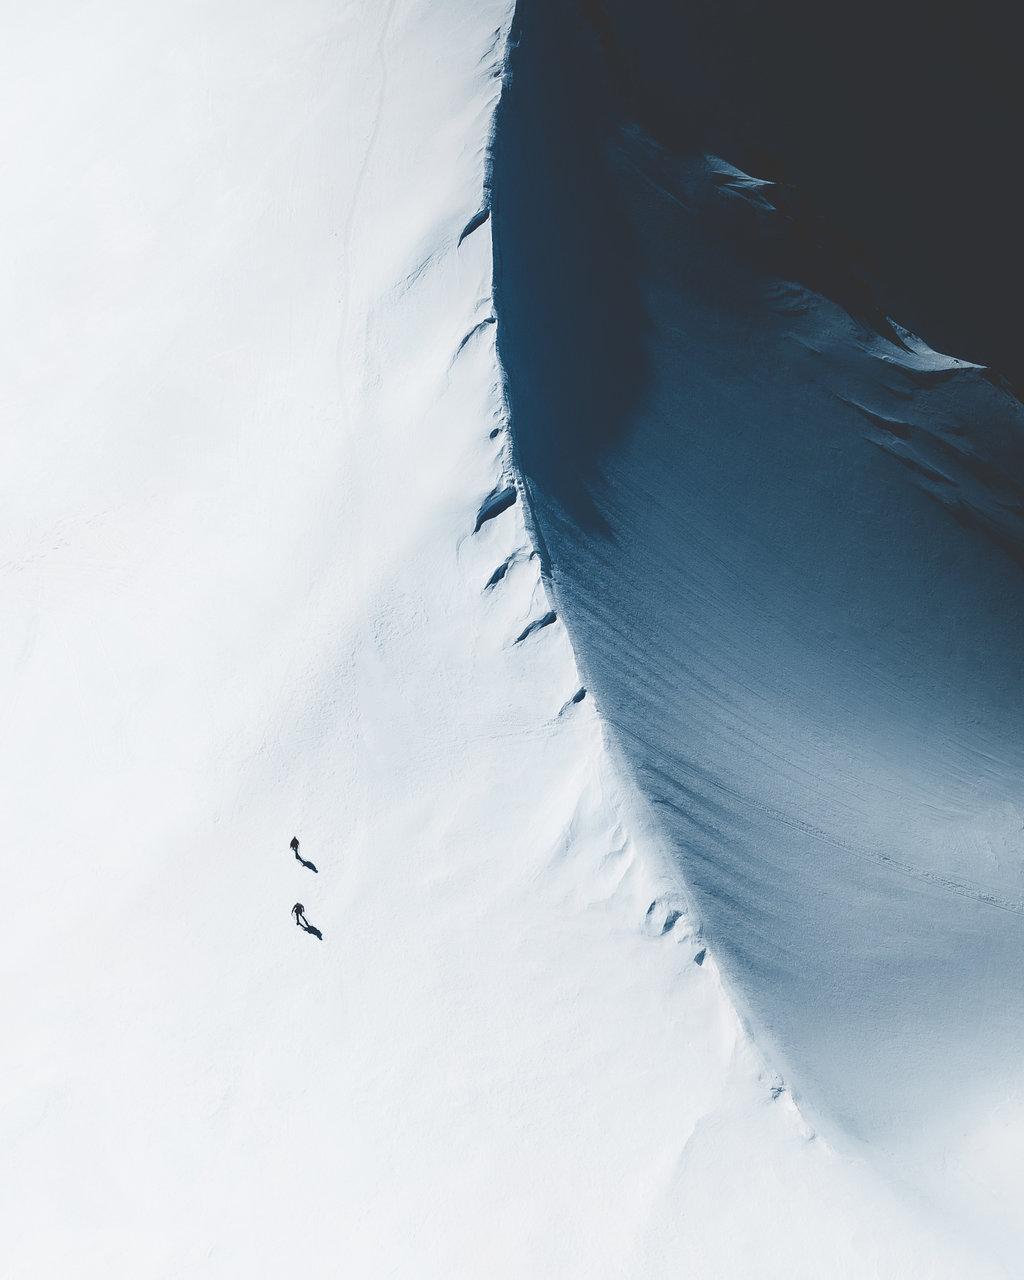 Бяла пустиня   Author Vladimir Evrov - evrov   PHOTO FORUM